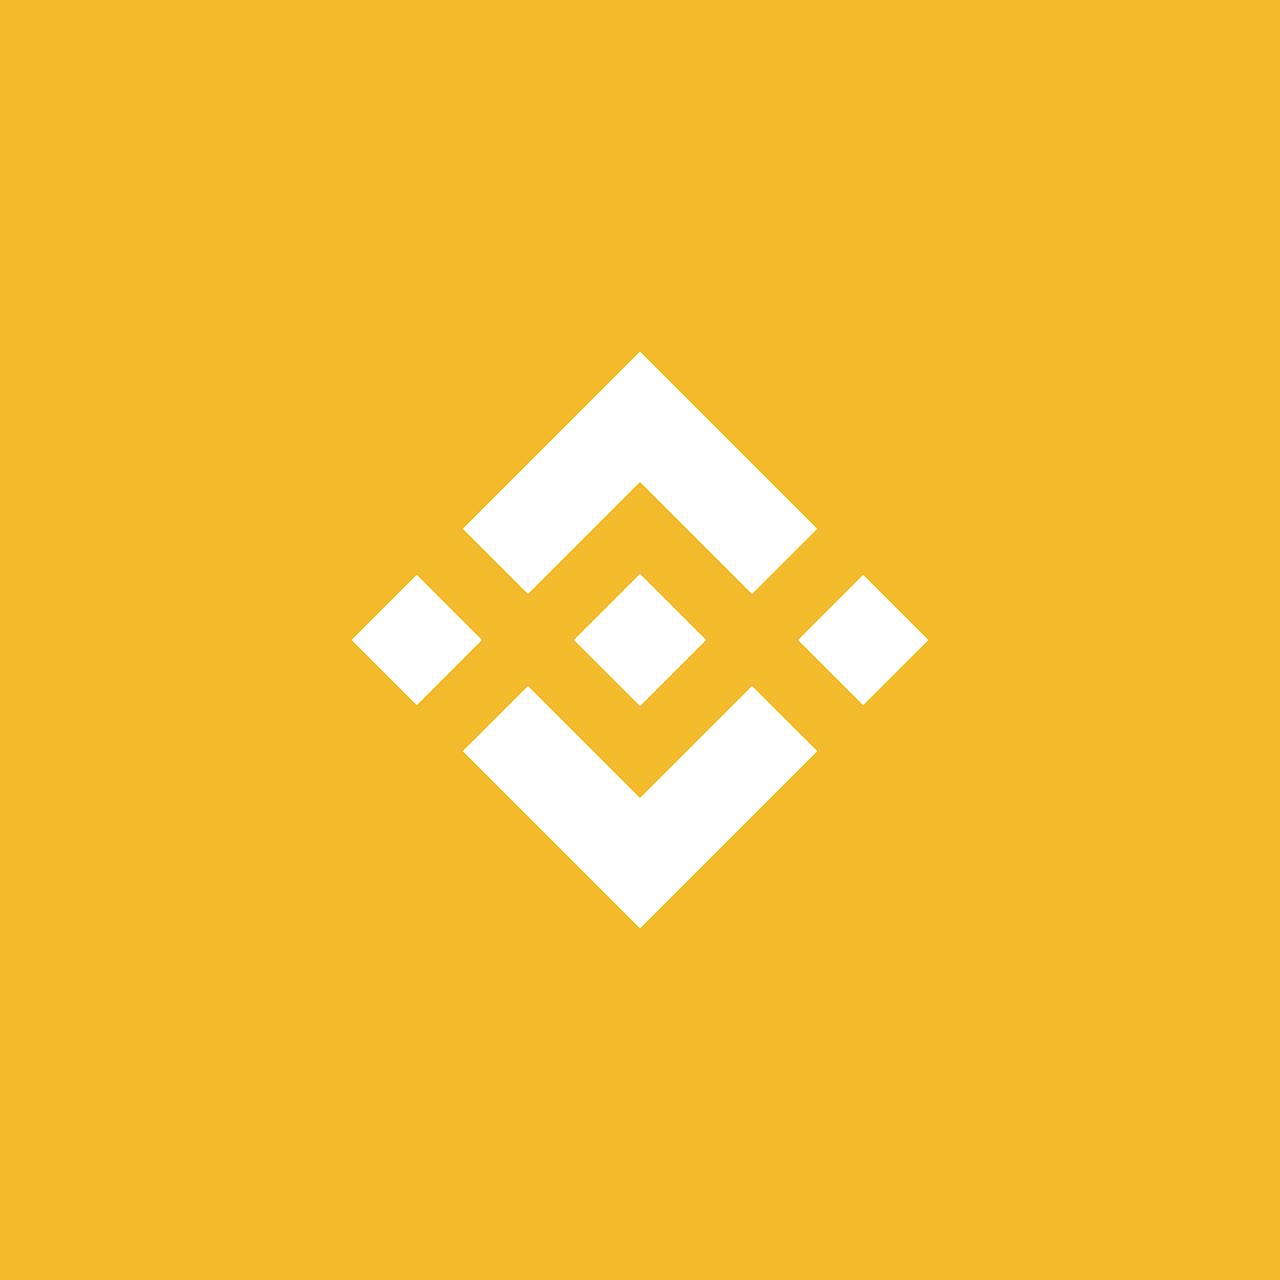 Polygon Wallet Now on Binance